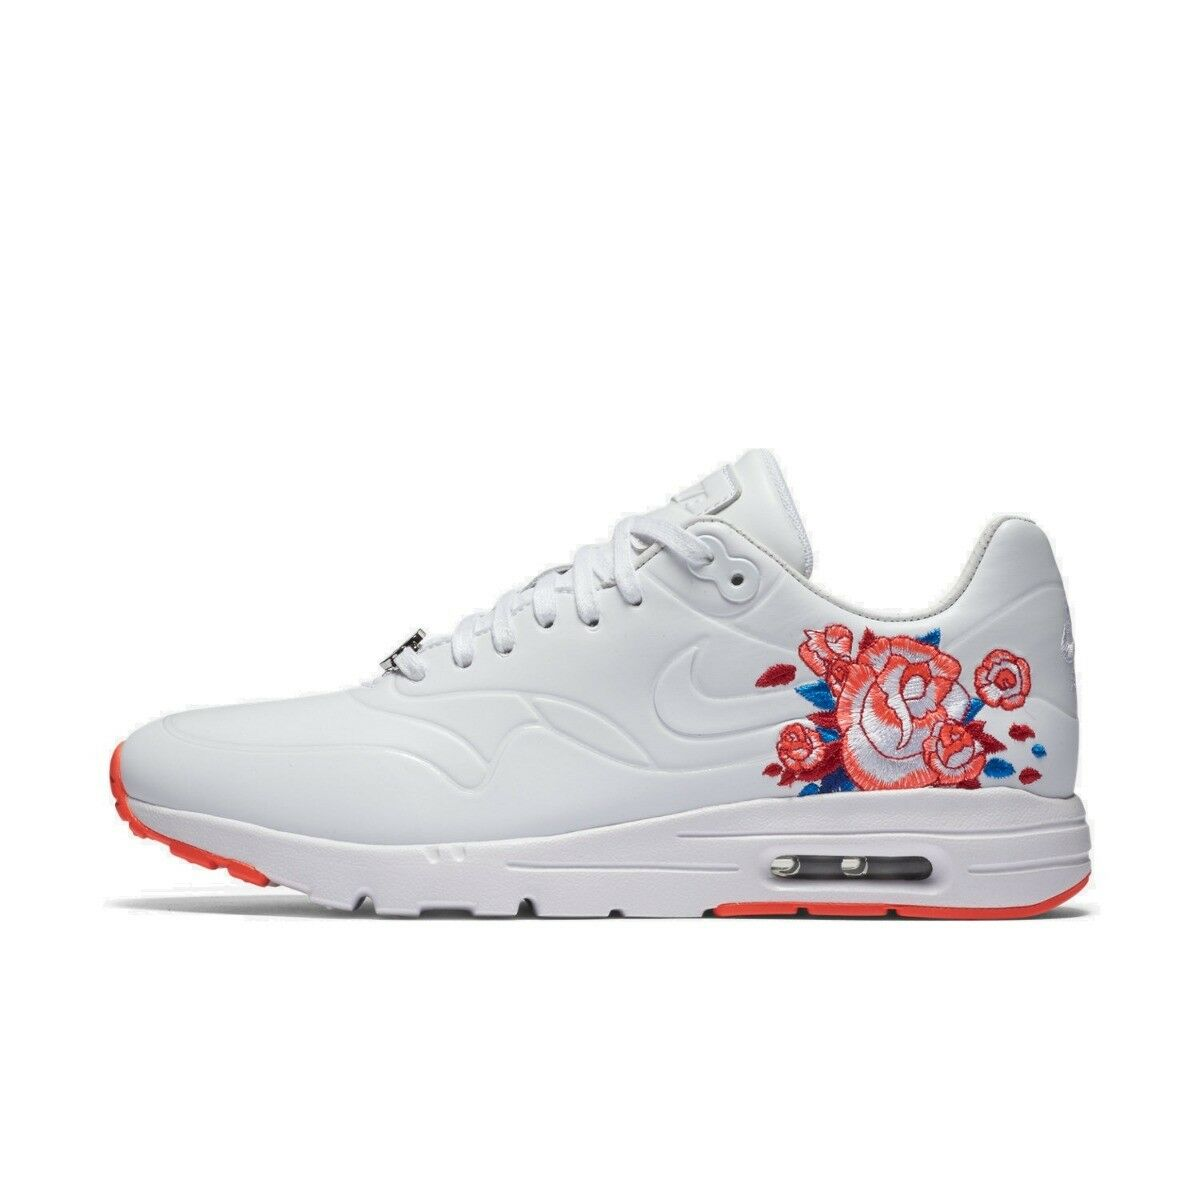 Para mujer Nike Air Max Ultra SW Qs Talla blancoo blancoo blancoo rosado Correr Entrenador   - Raro  comprar mejor